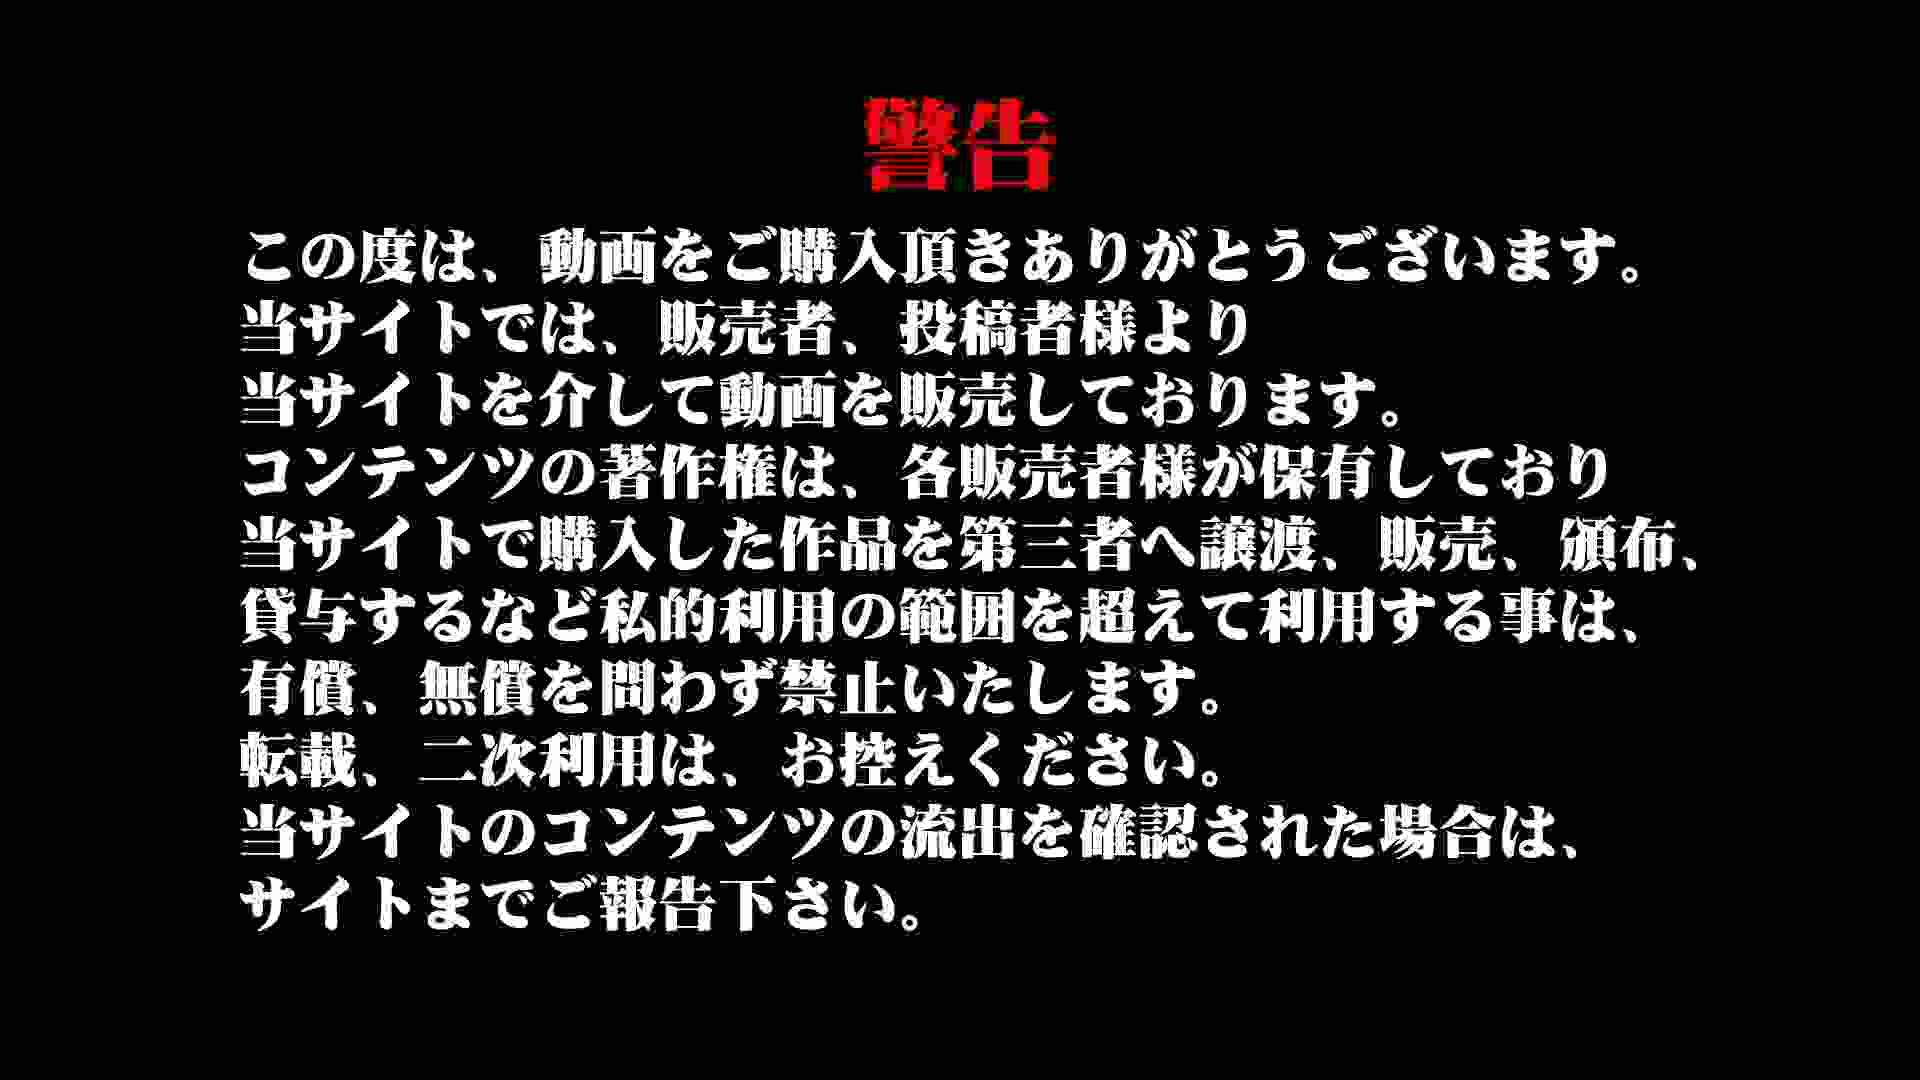 芸術大学ガチ潜入盗撮 JD盗撮 美女の洗面所の秘密 Vol.88 美肌 オメコ無修正動画無料 83枚 5